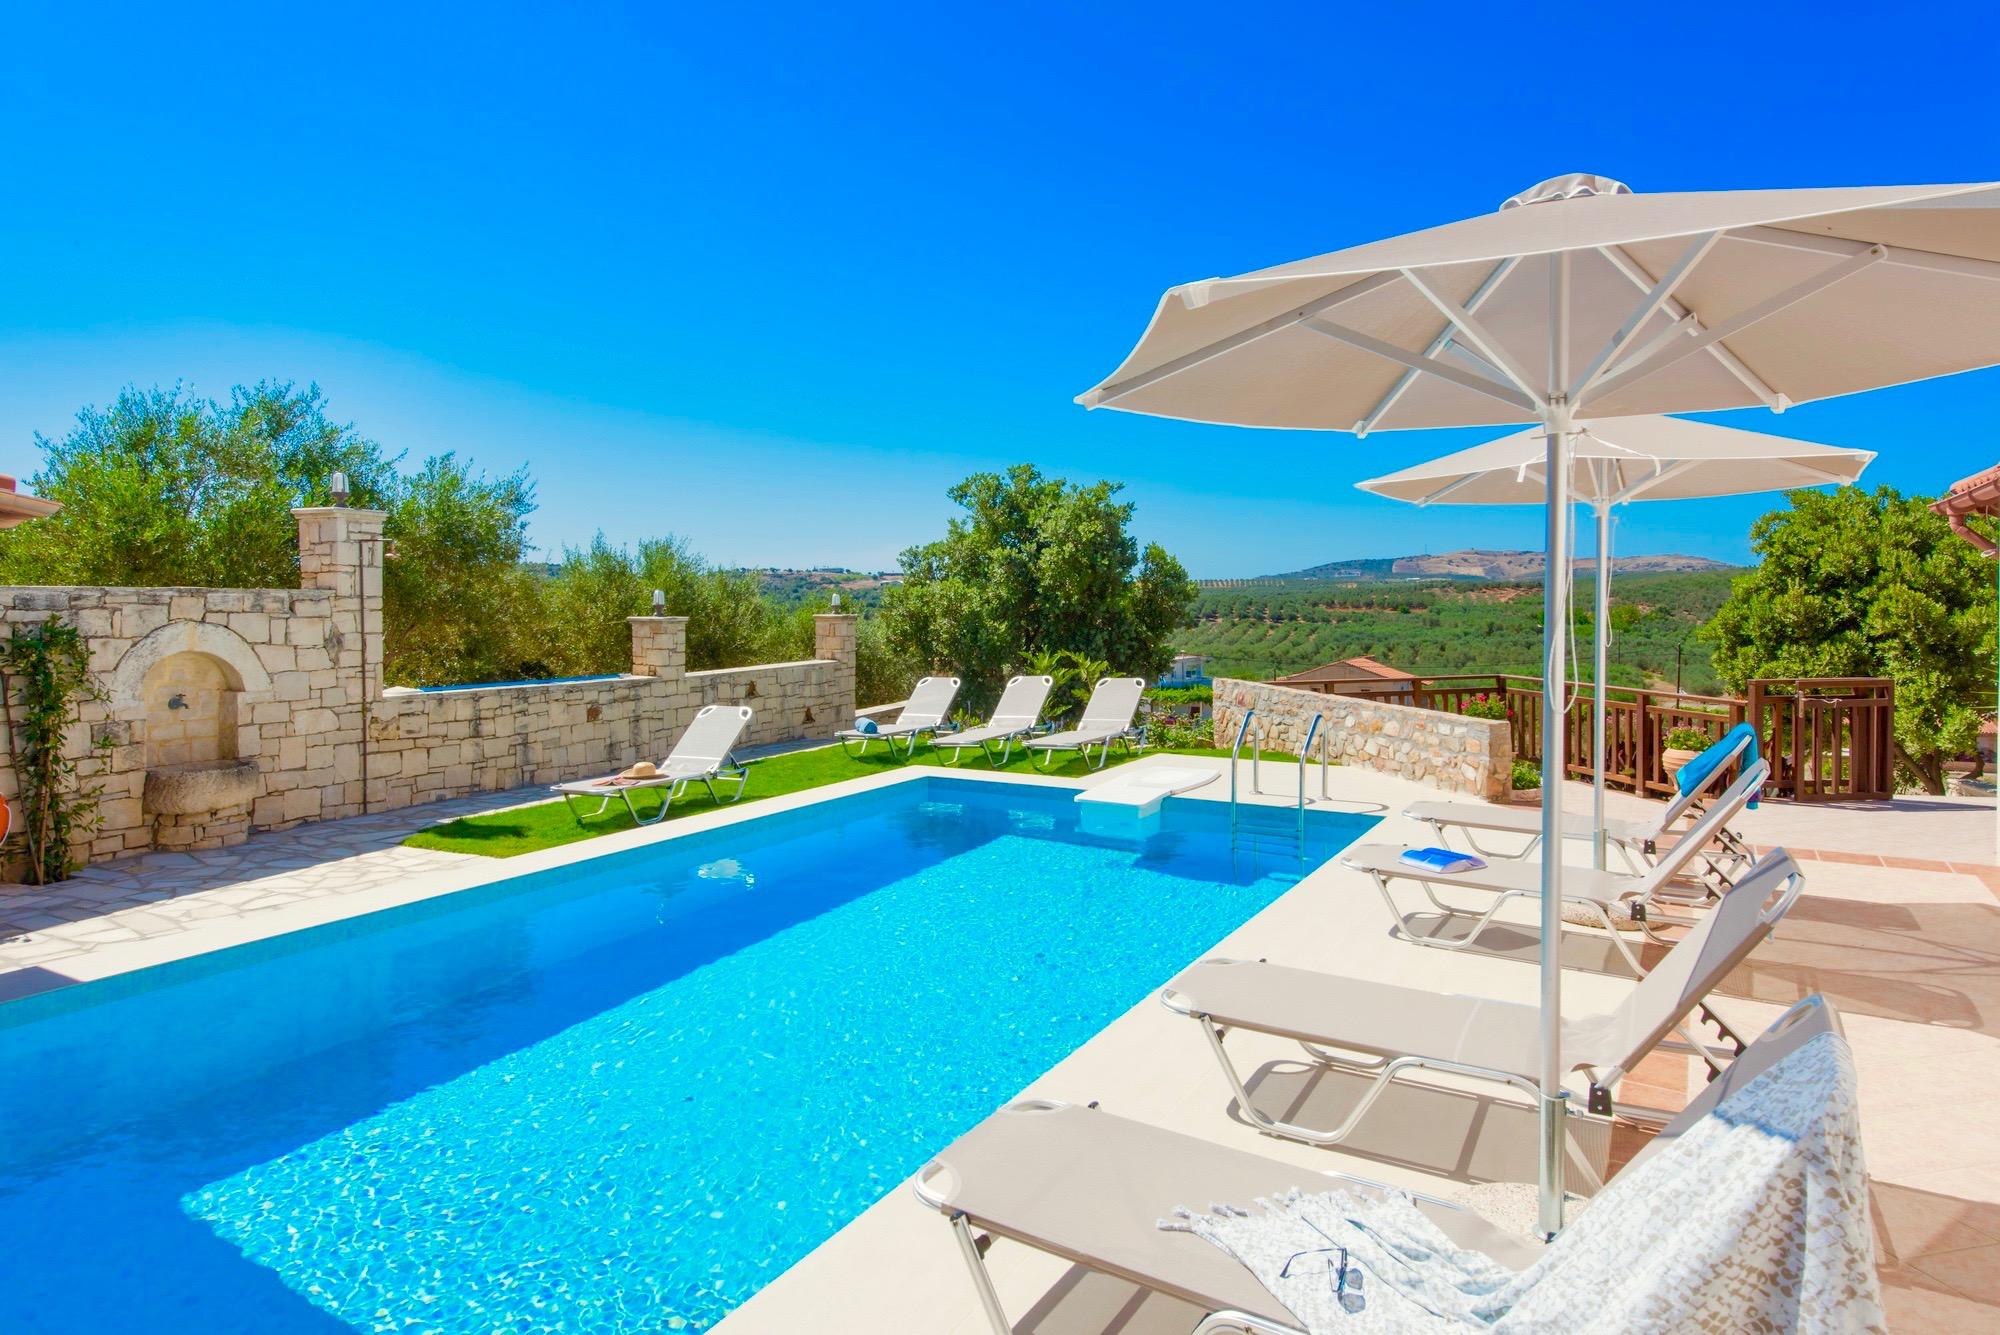 Ferienhaus Luxury Villa Korini with private swimming pool (2470495), Roumeli, Kreta Nordküste, Kreta, Griechenland, Bild 23